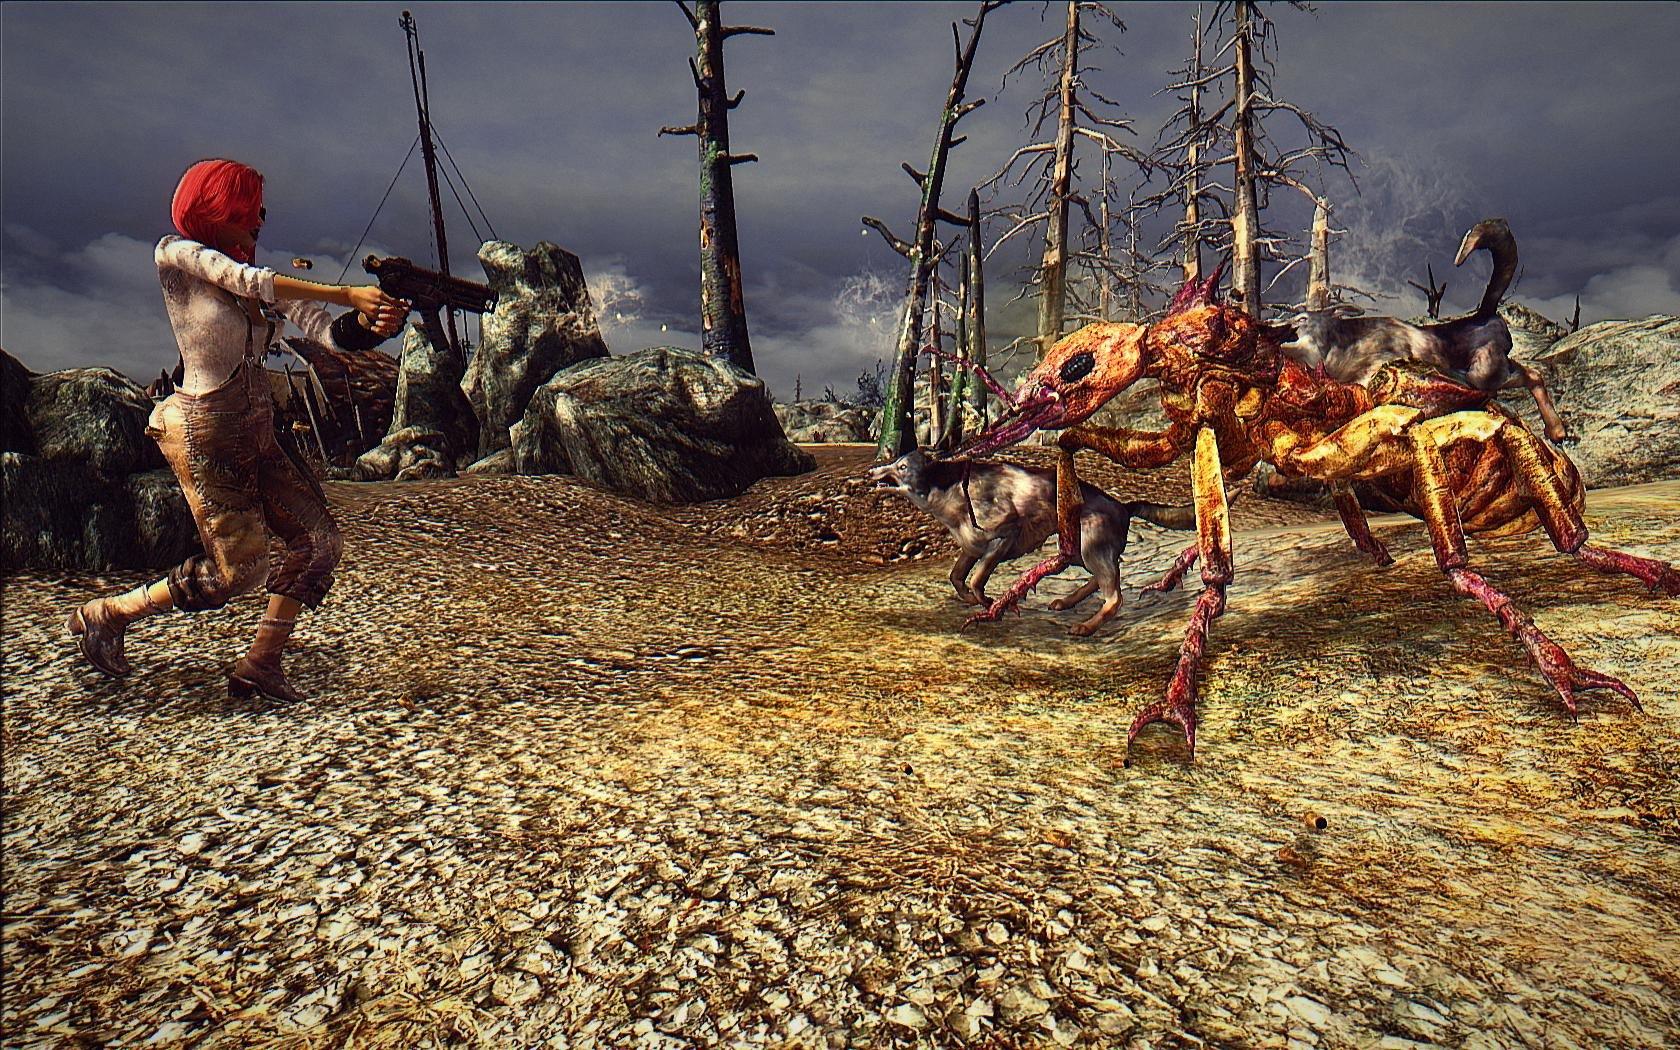 Fallout3 2019-04-12 18-51-16-18